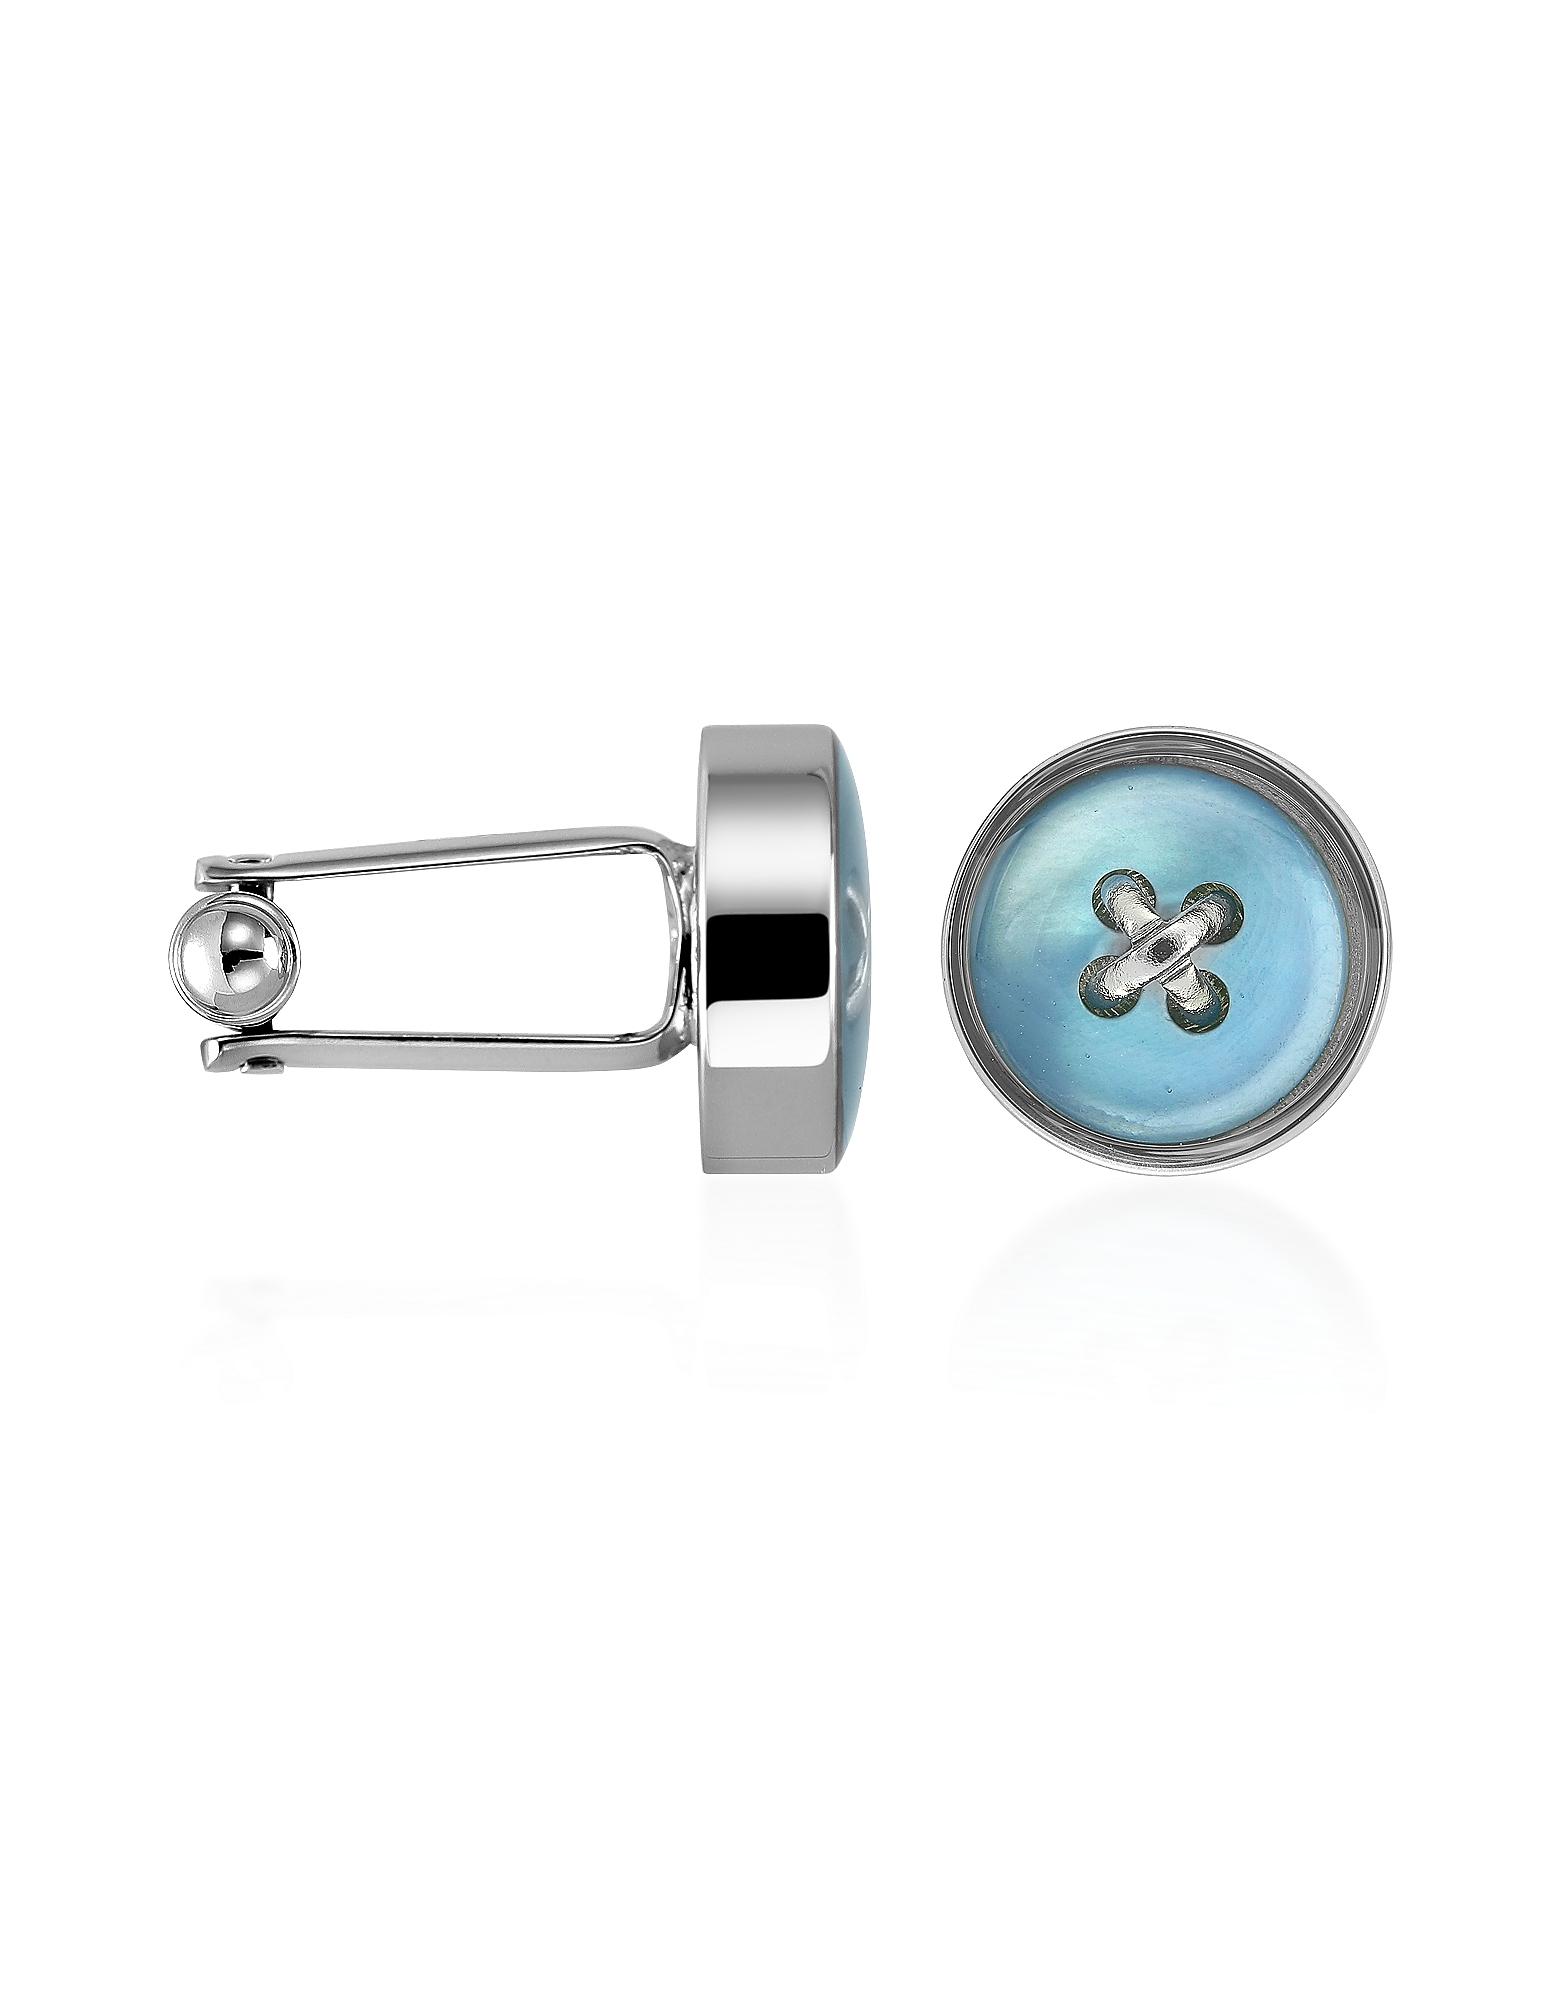 Forzieri Designer Cufflinks, Blue Button Mother-of-Pearl Silver Plated Cufflinks